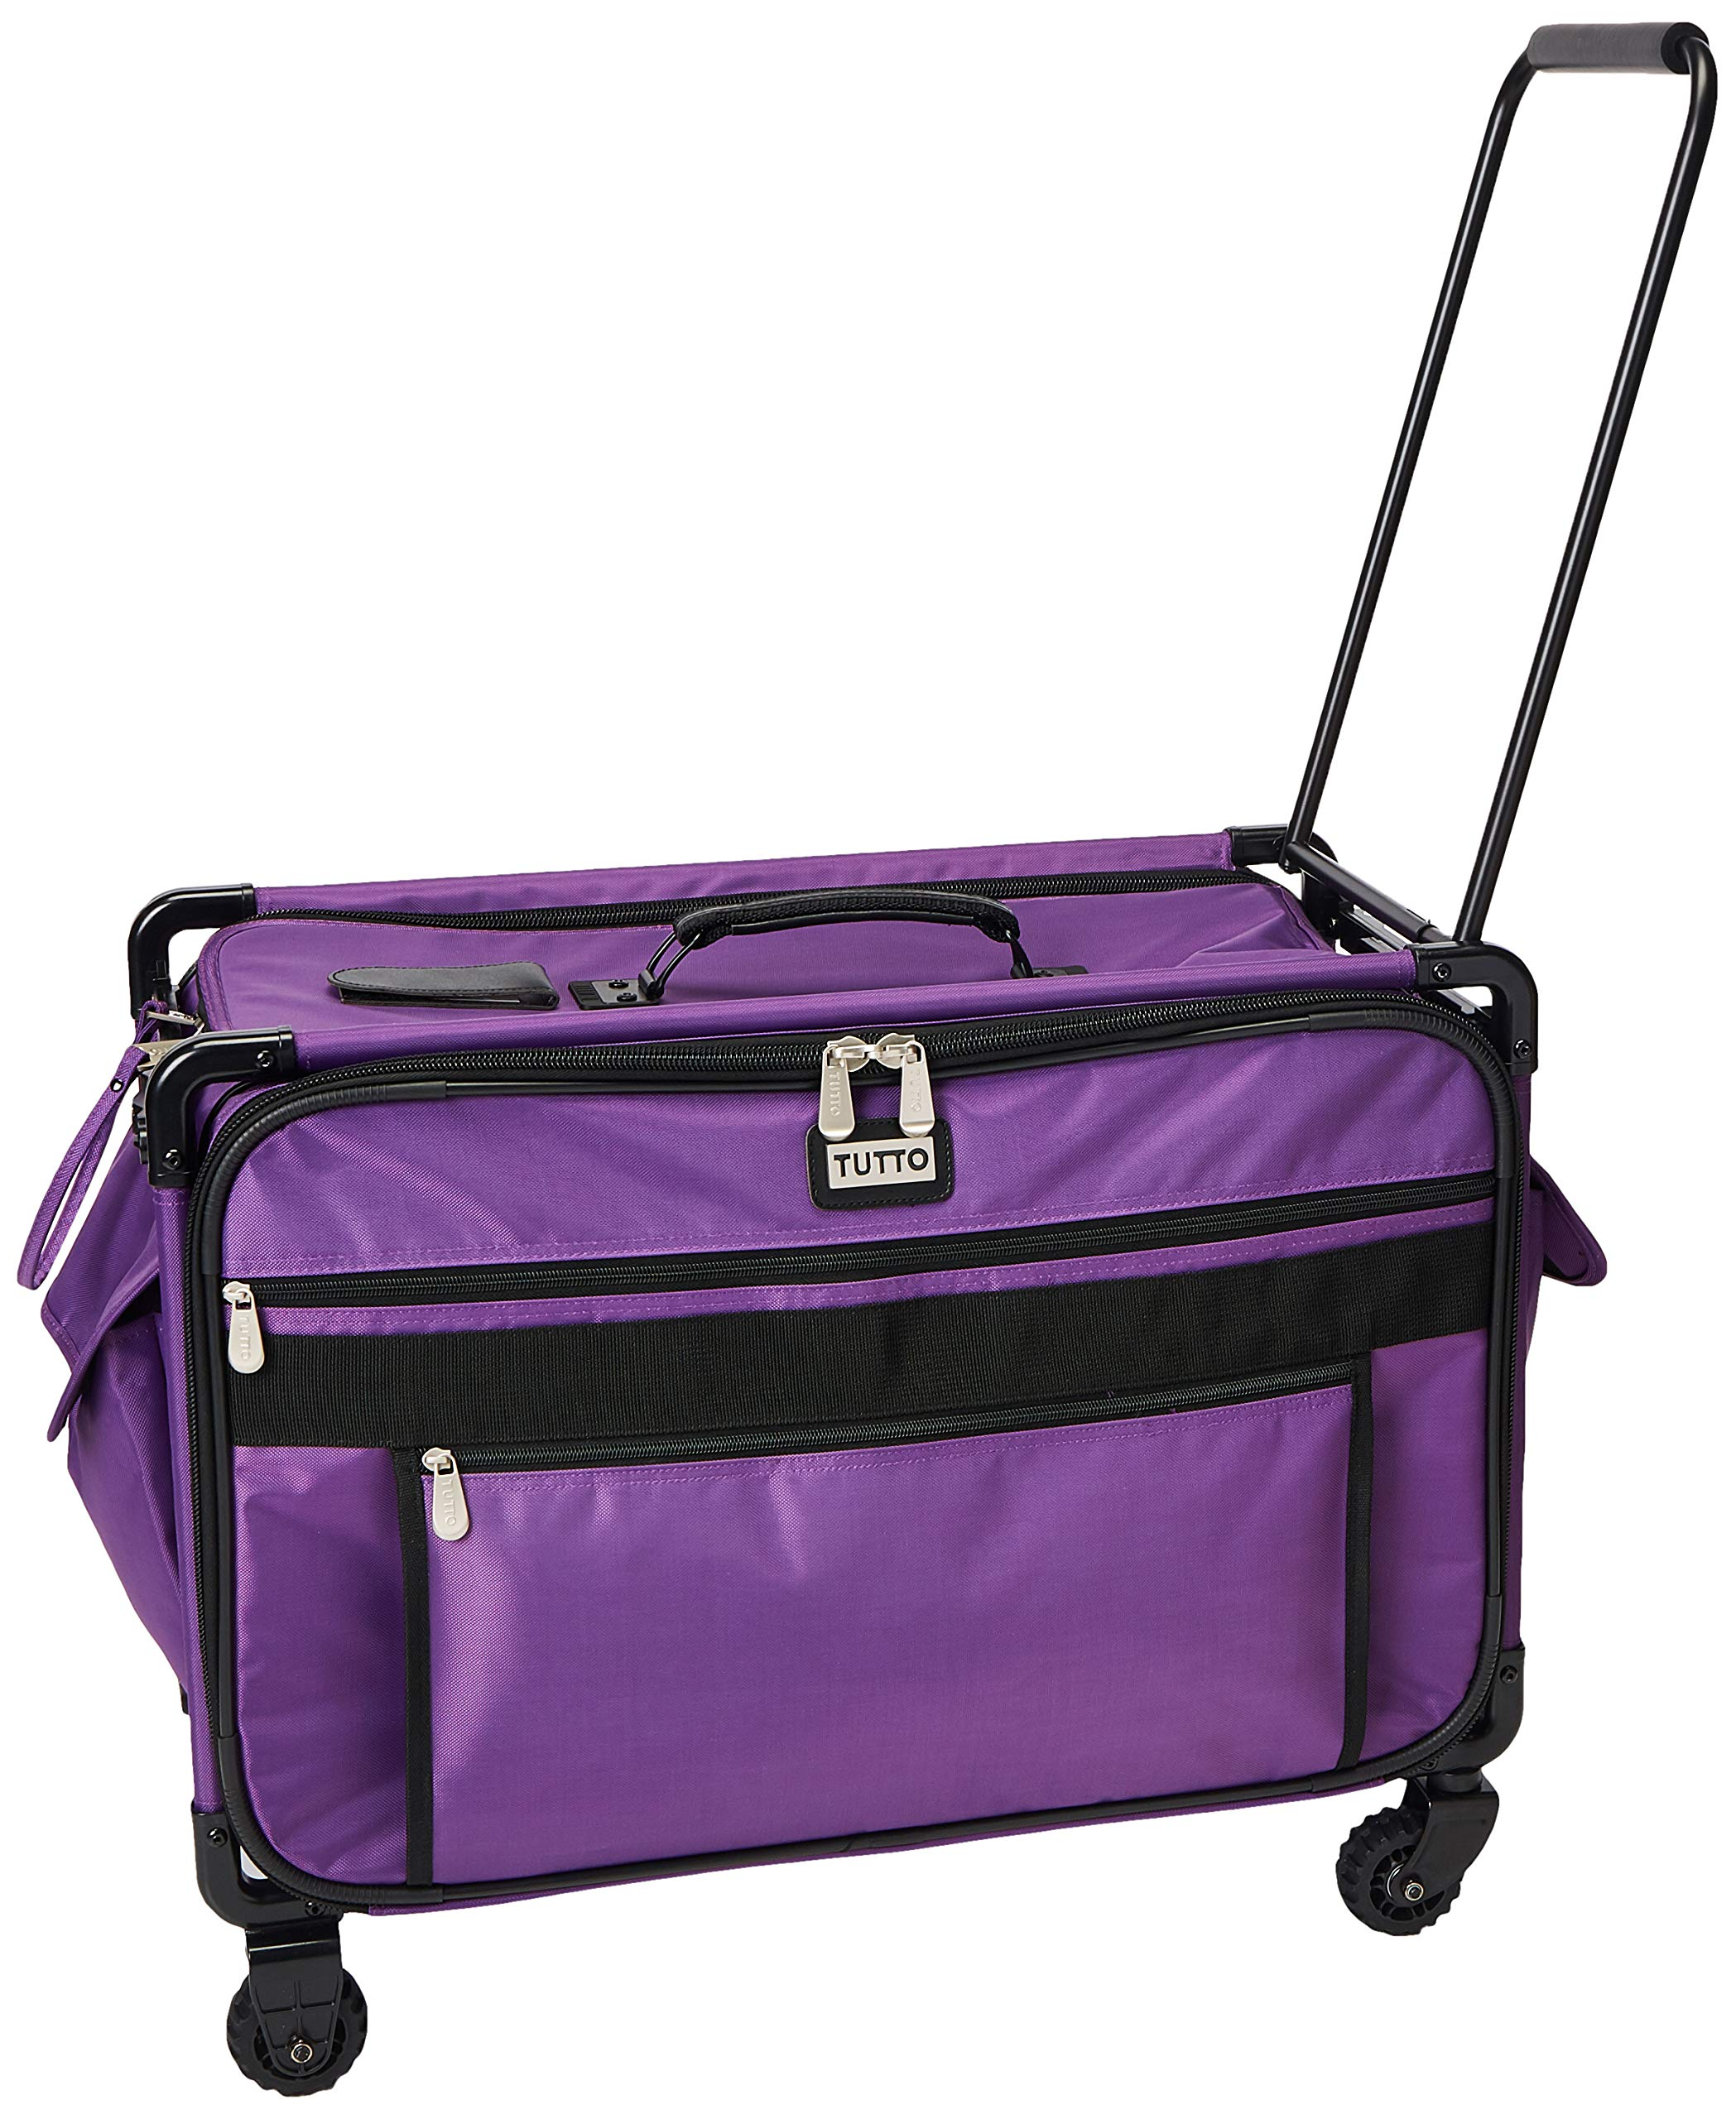 Mascot Metropolitan Tutto Machine Case On Wheels Extra Large 24in Purple, X-Large/24 by Mascot Metropolitan